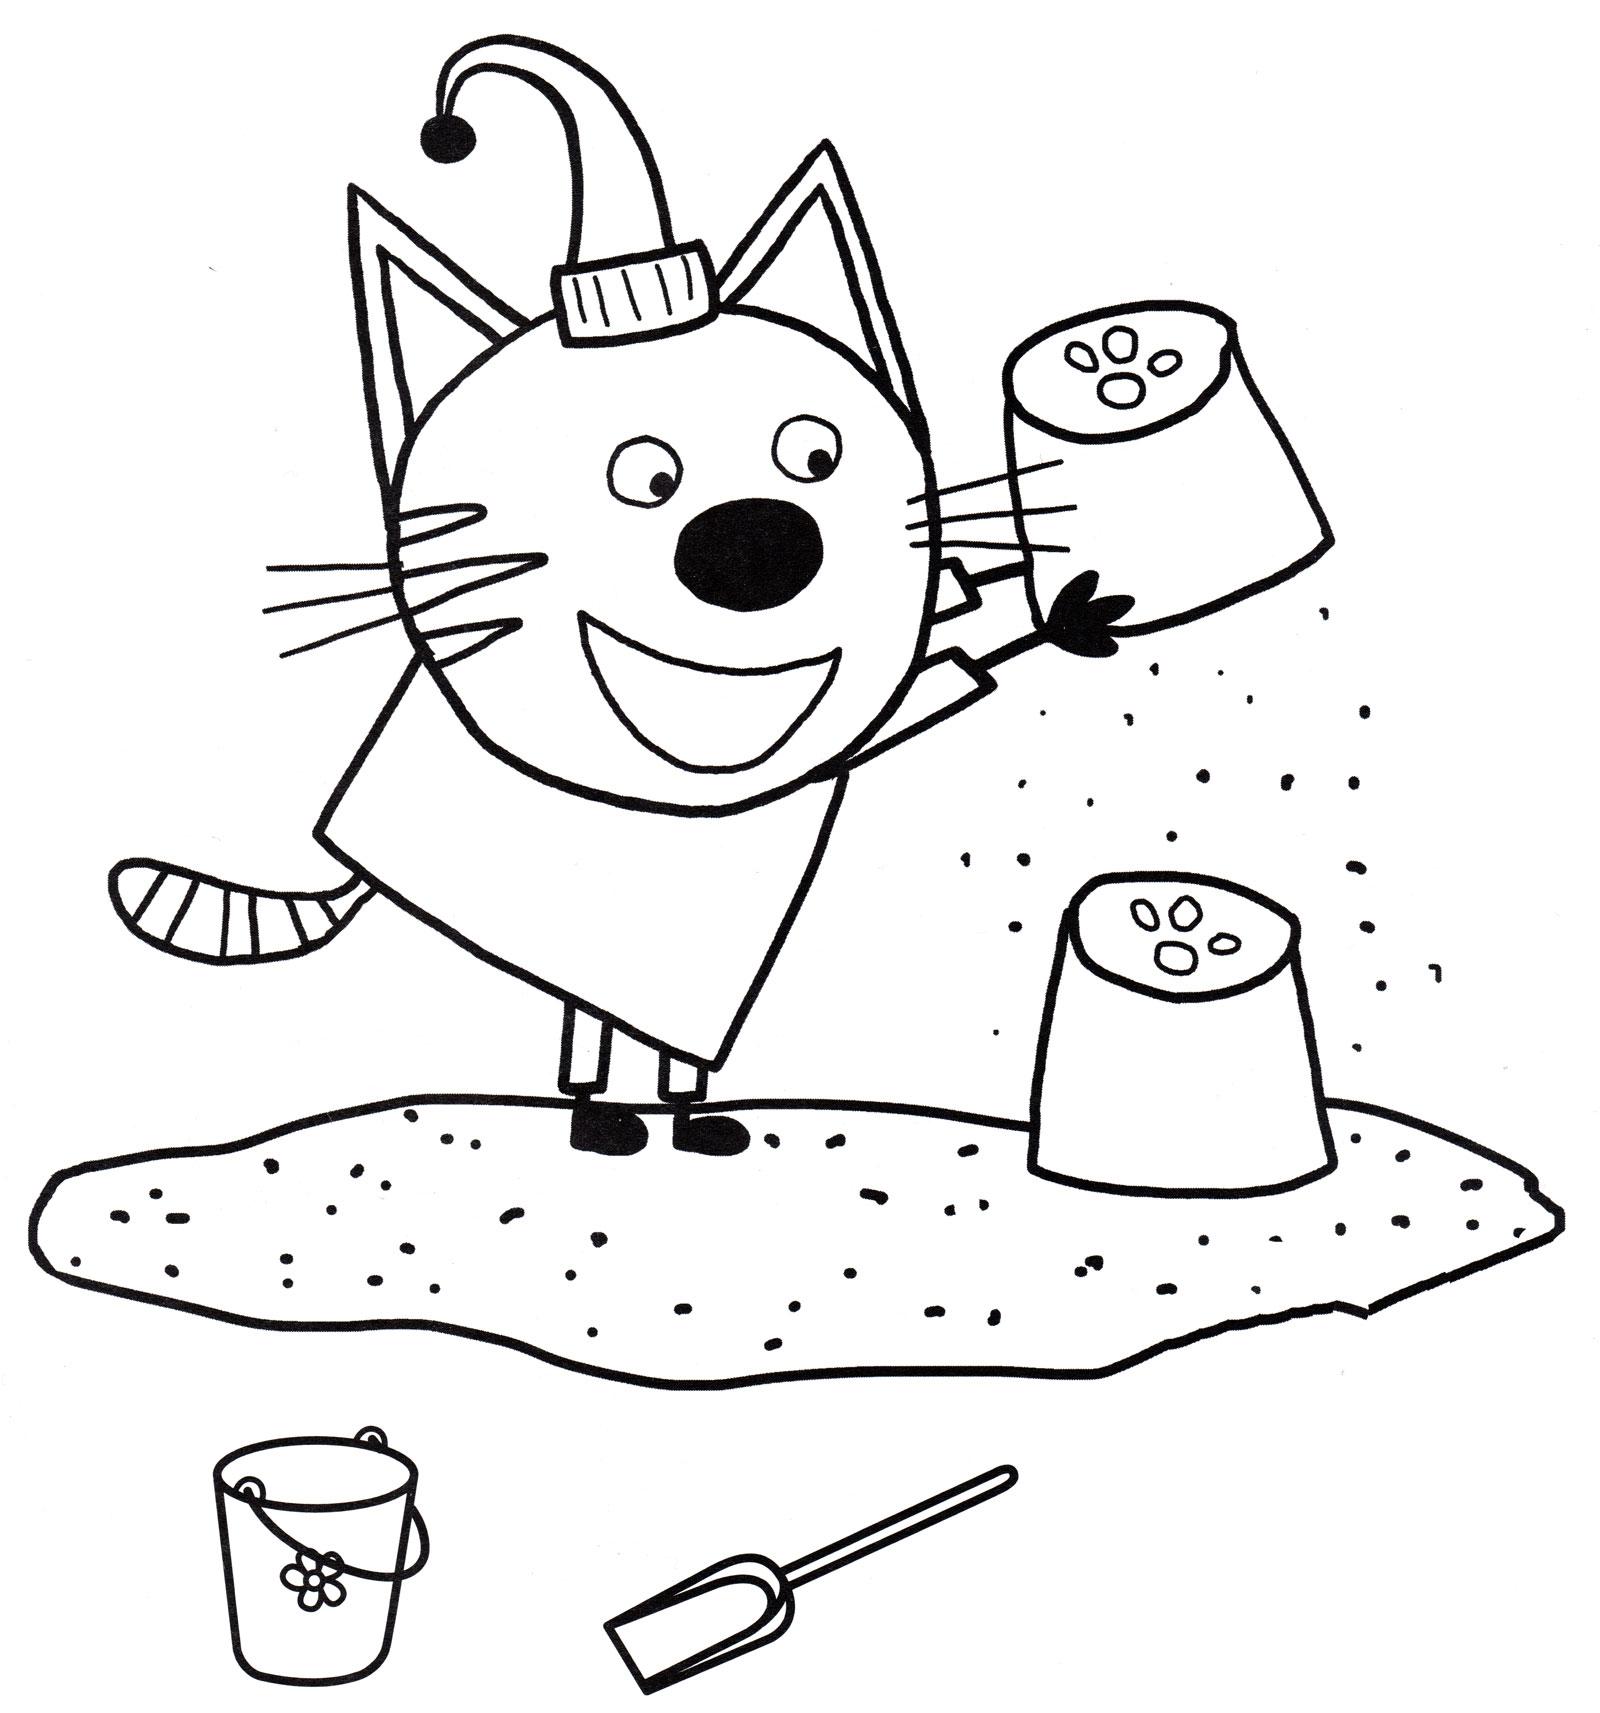 Раскраска Компот играет в песочнице | Раскраски Три кота